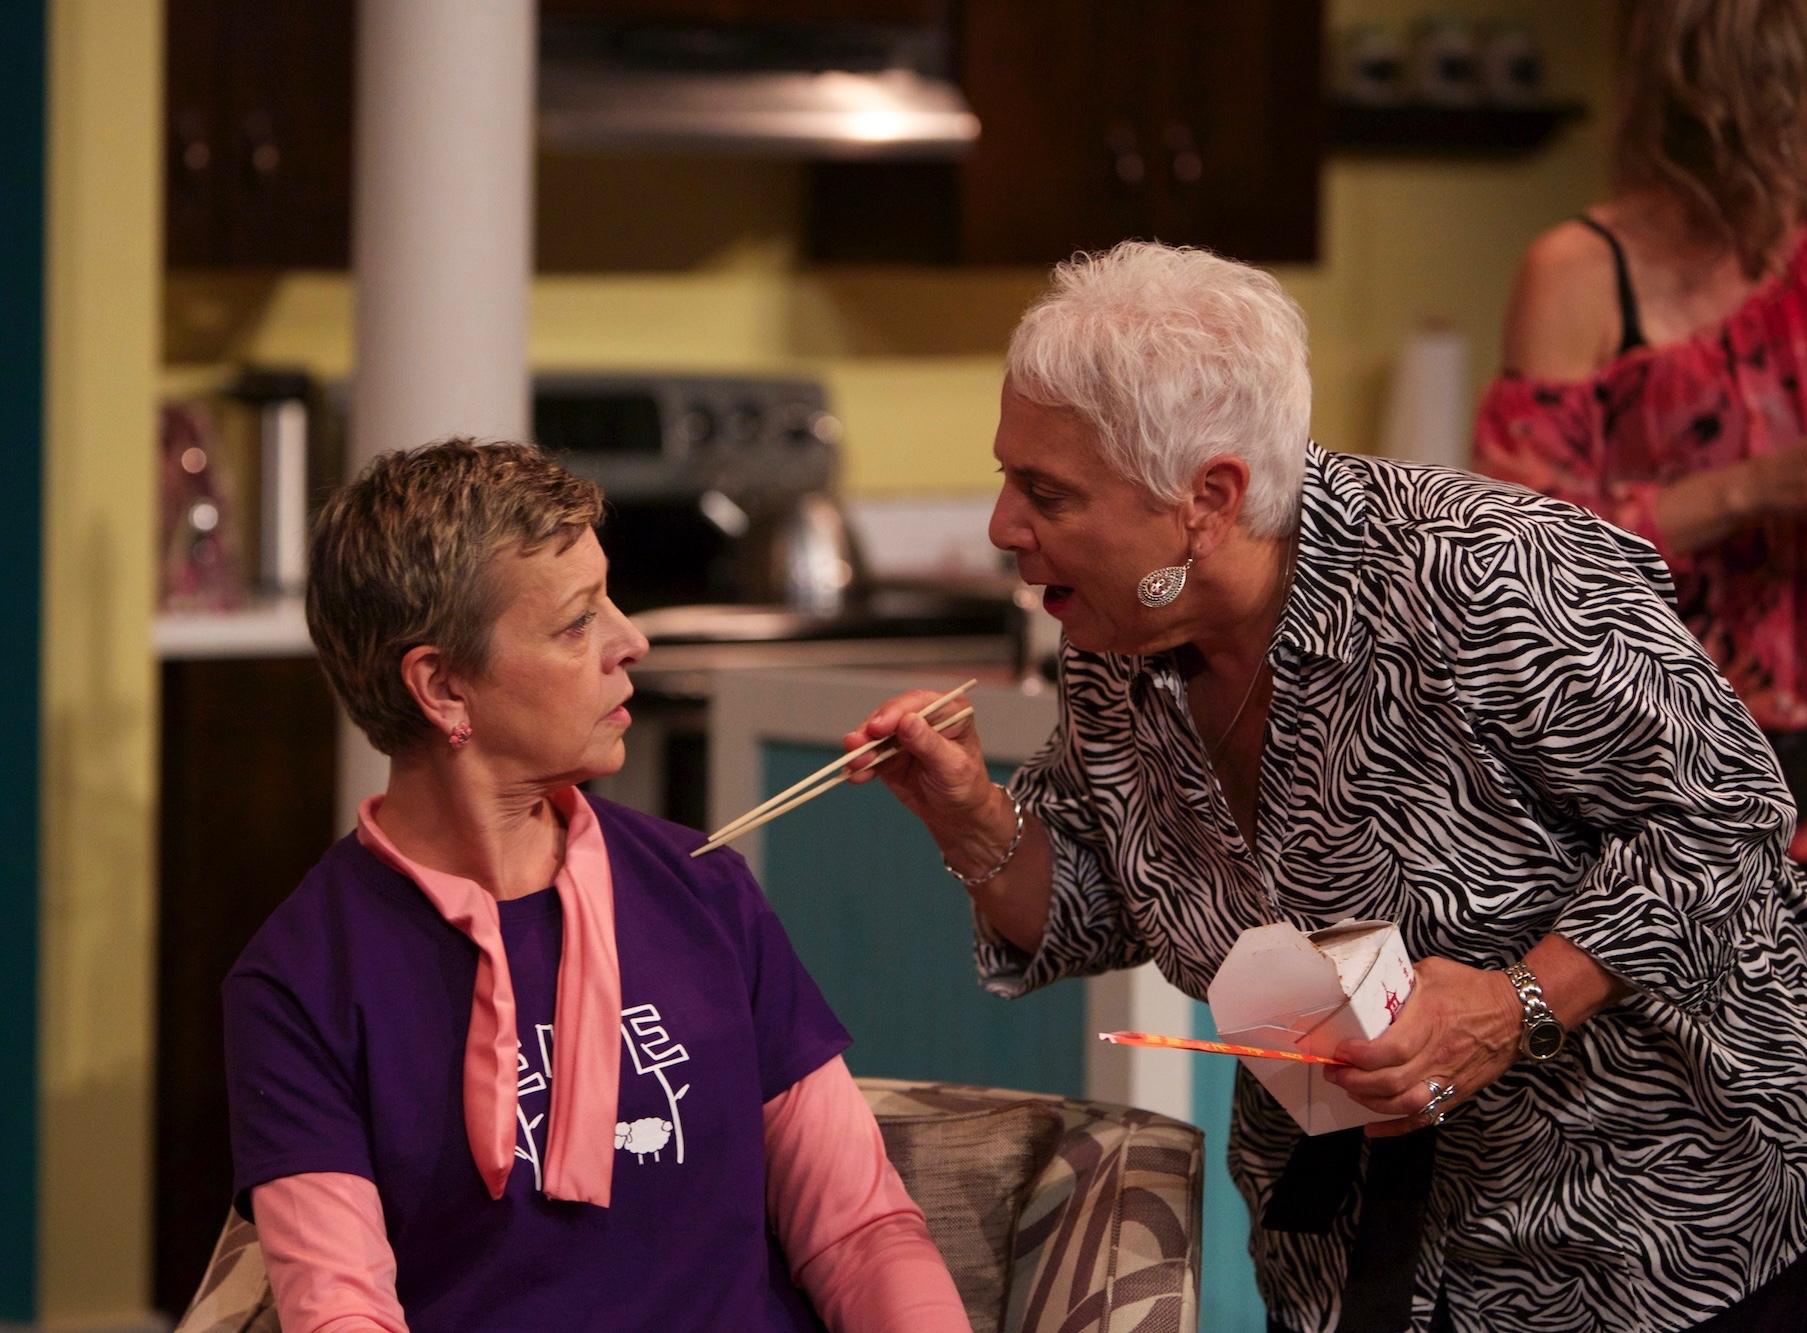 TFOE Patty and Joyce with chopsticks.jpg